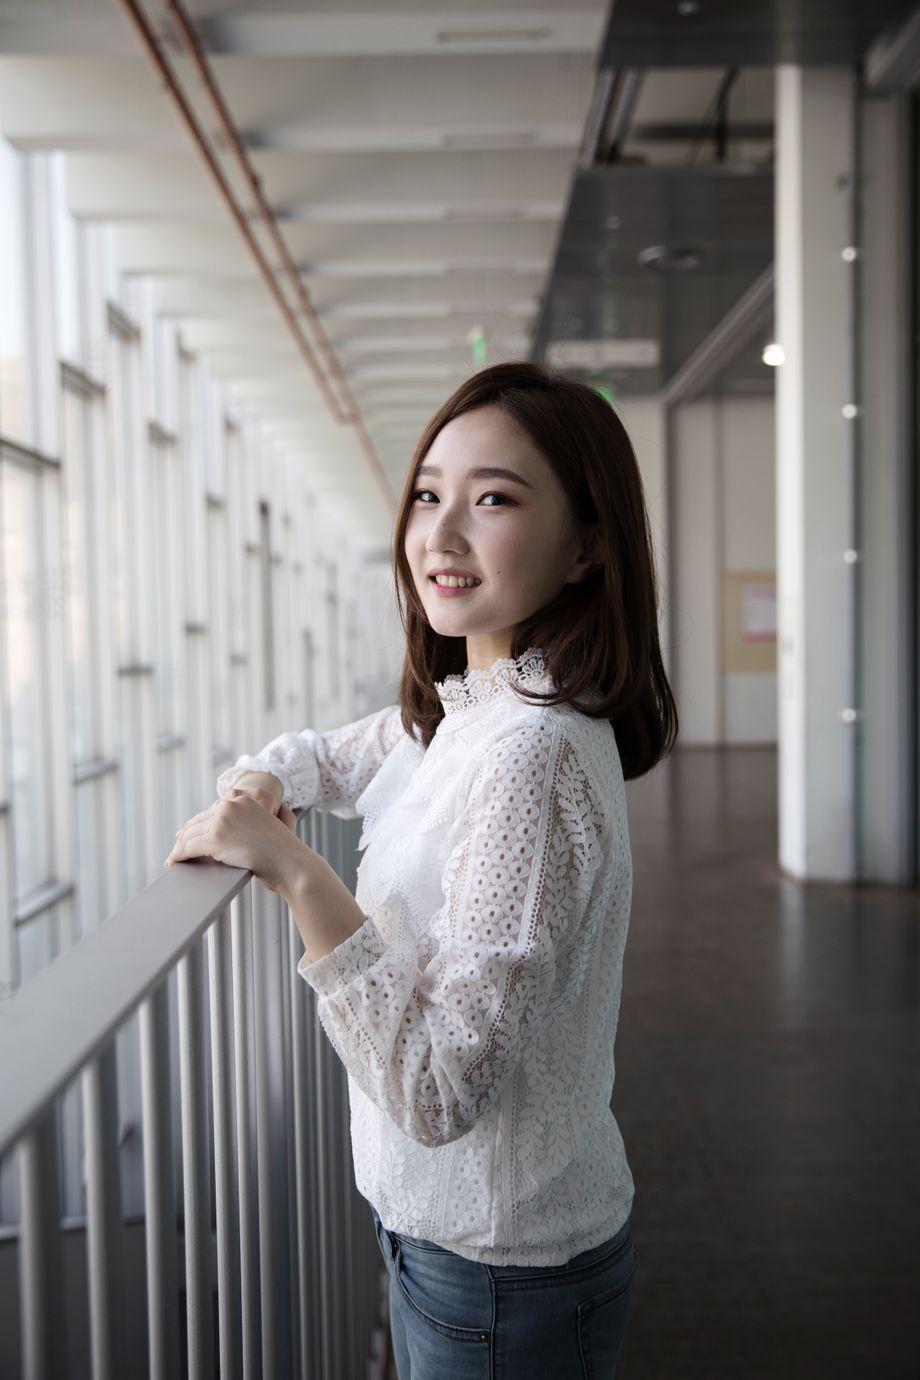 Der Studentin Jang Ji-hyun gefällt, dass Pengsoo alle Menschen gleich behandelt